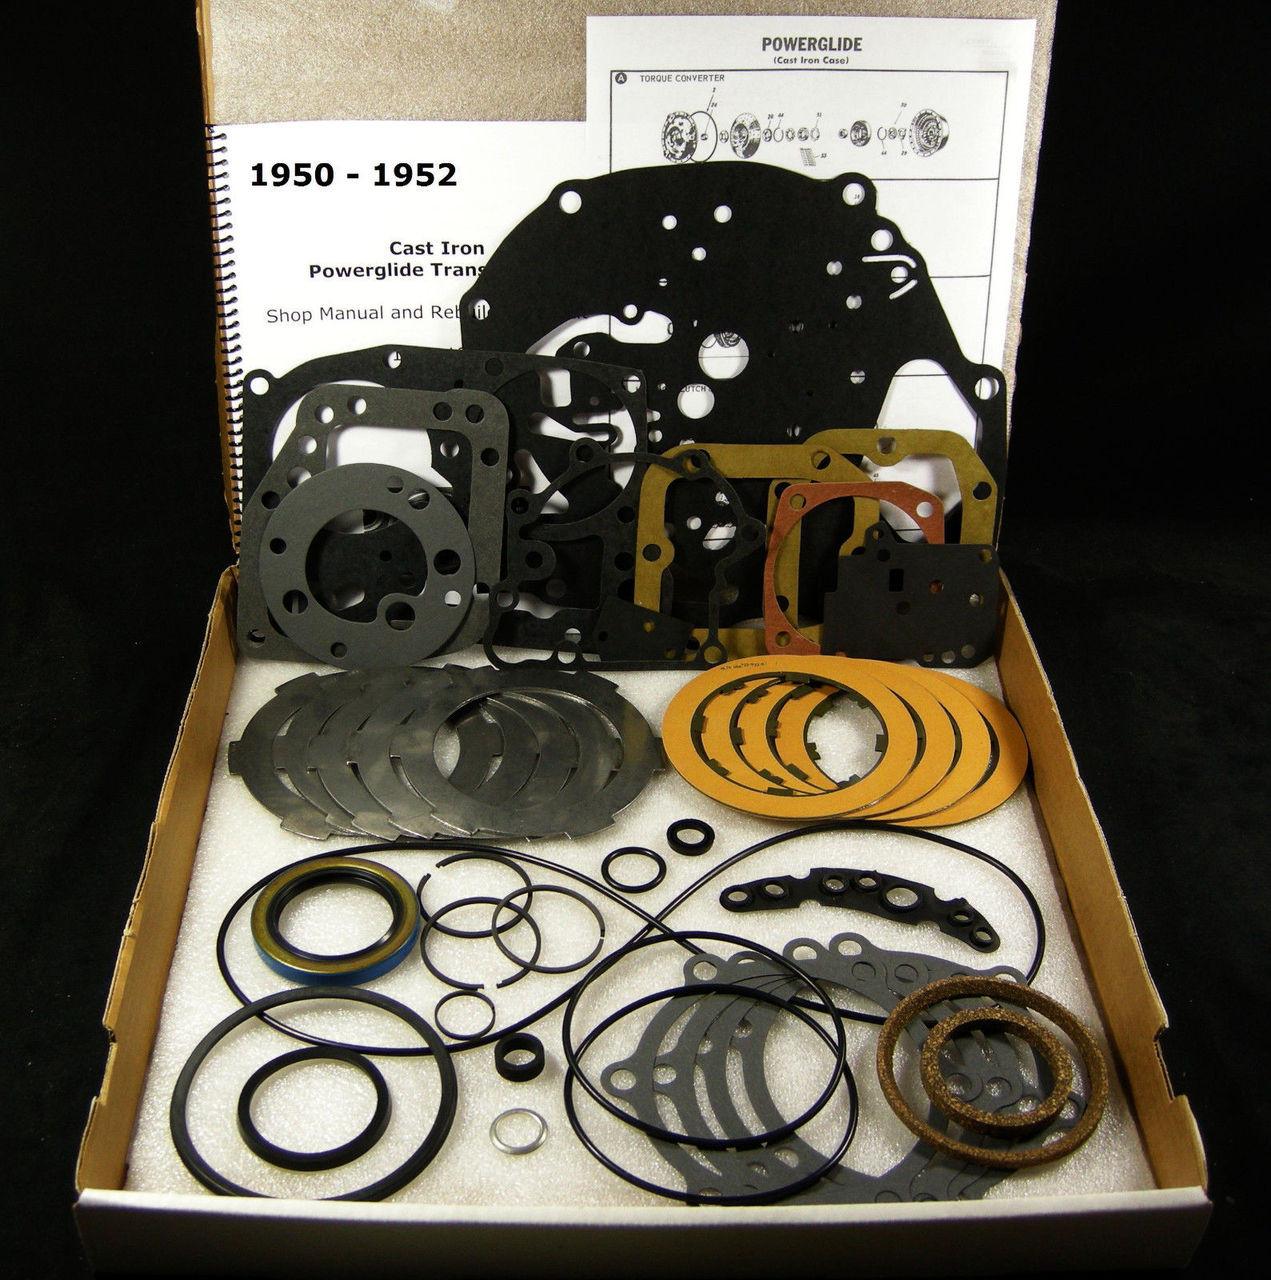 950 52 cast iron powerglide transmission rebuild overhaul part kit [ 1271 x 1280 Pixel ]